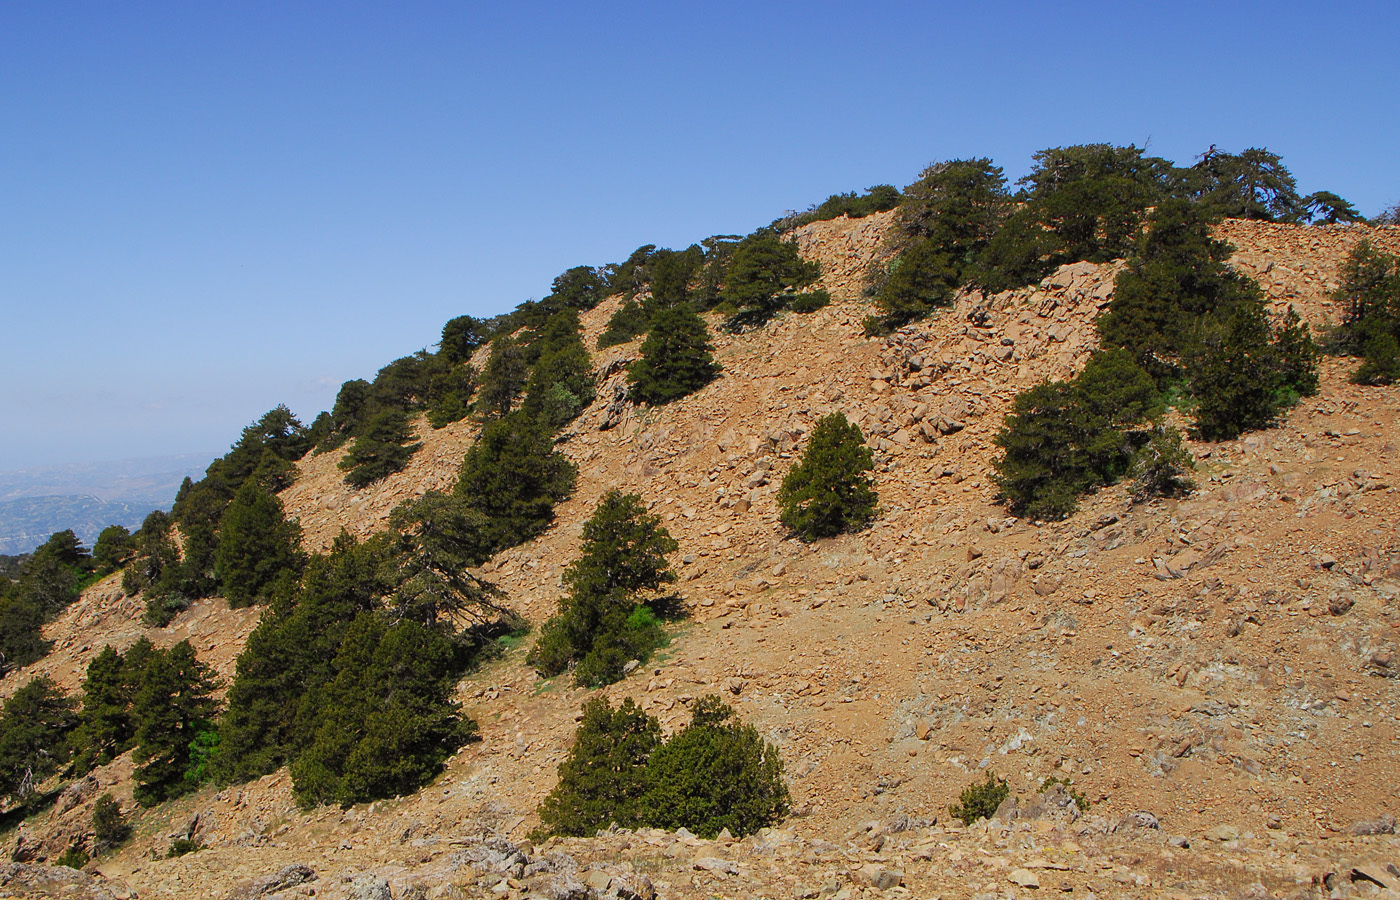 https://pictures.bgbm.org/digilib/Scaler?fn=Cyprus/Juniperus_foetidissima_E1.jpg&mo=file